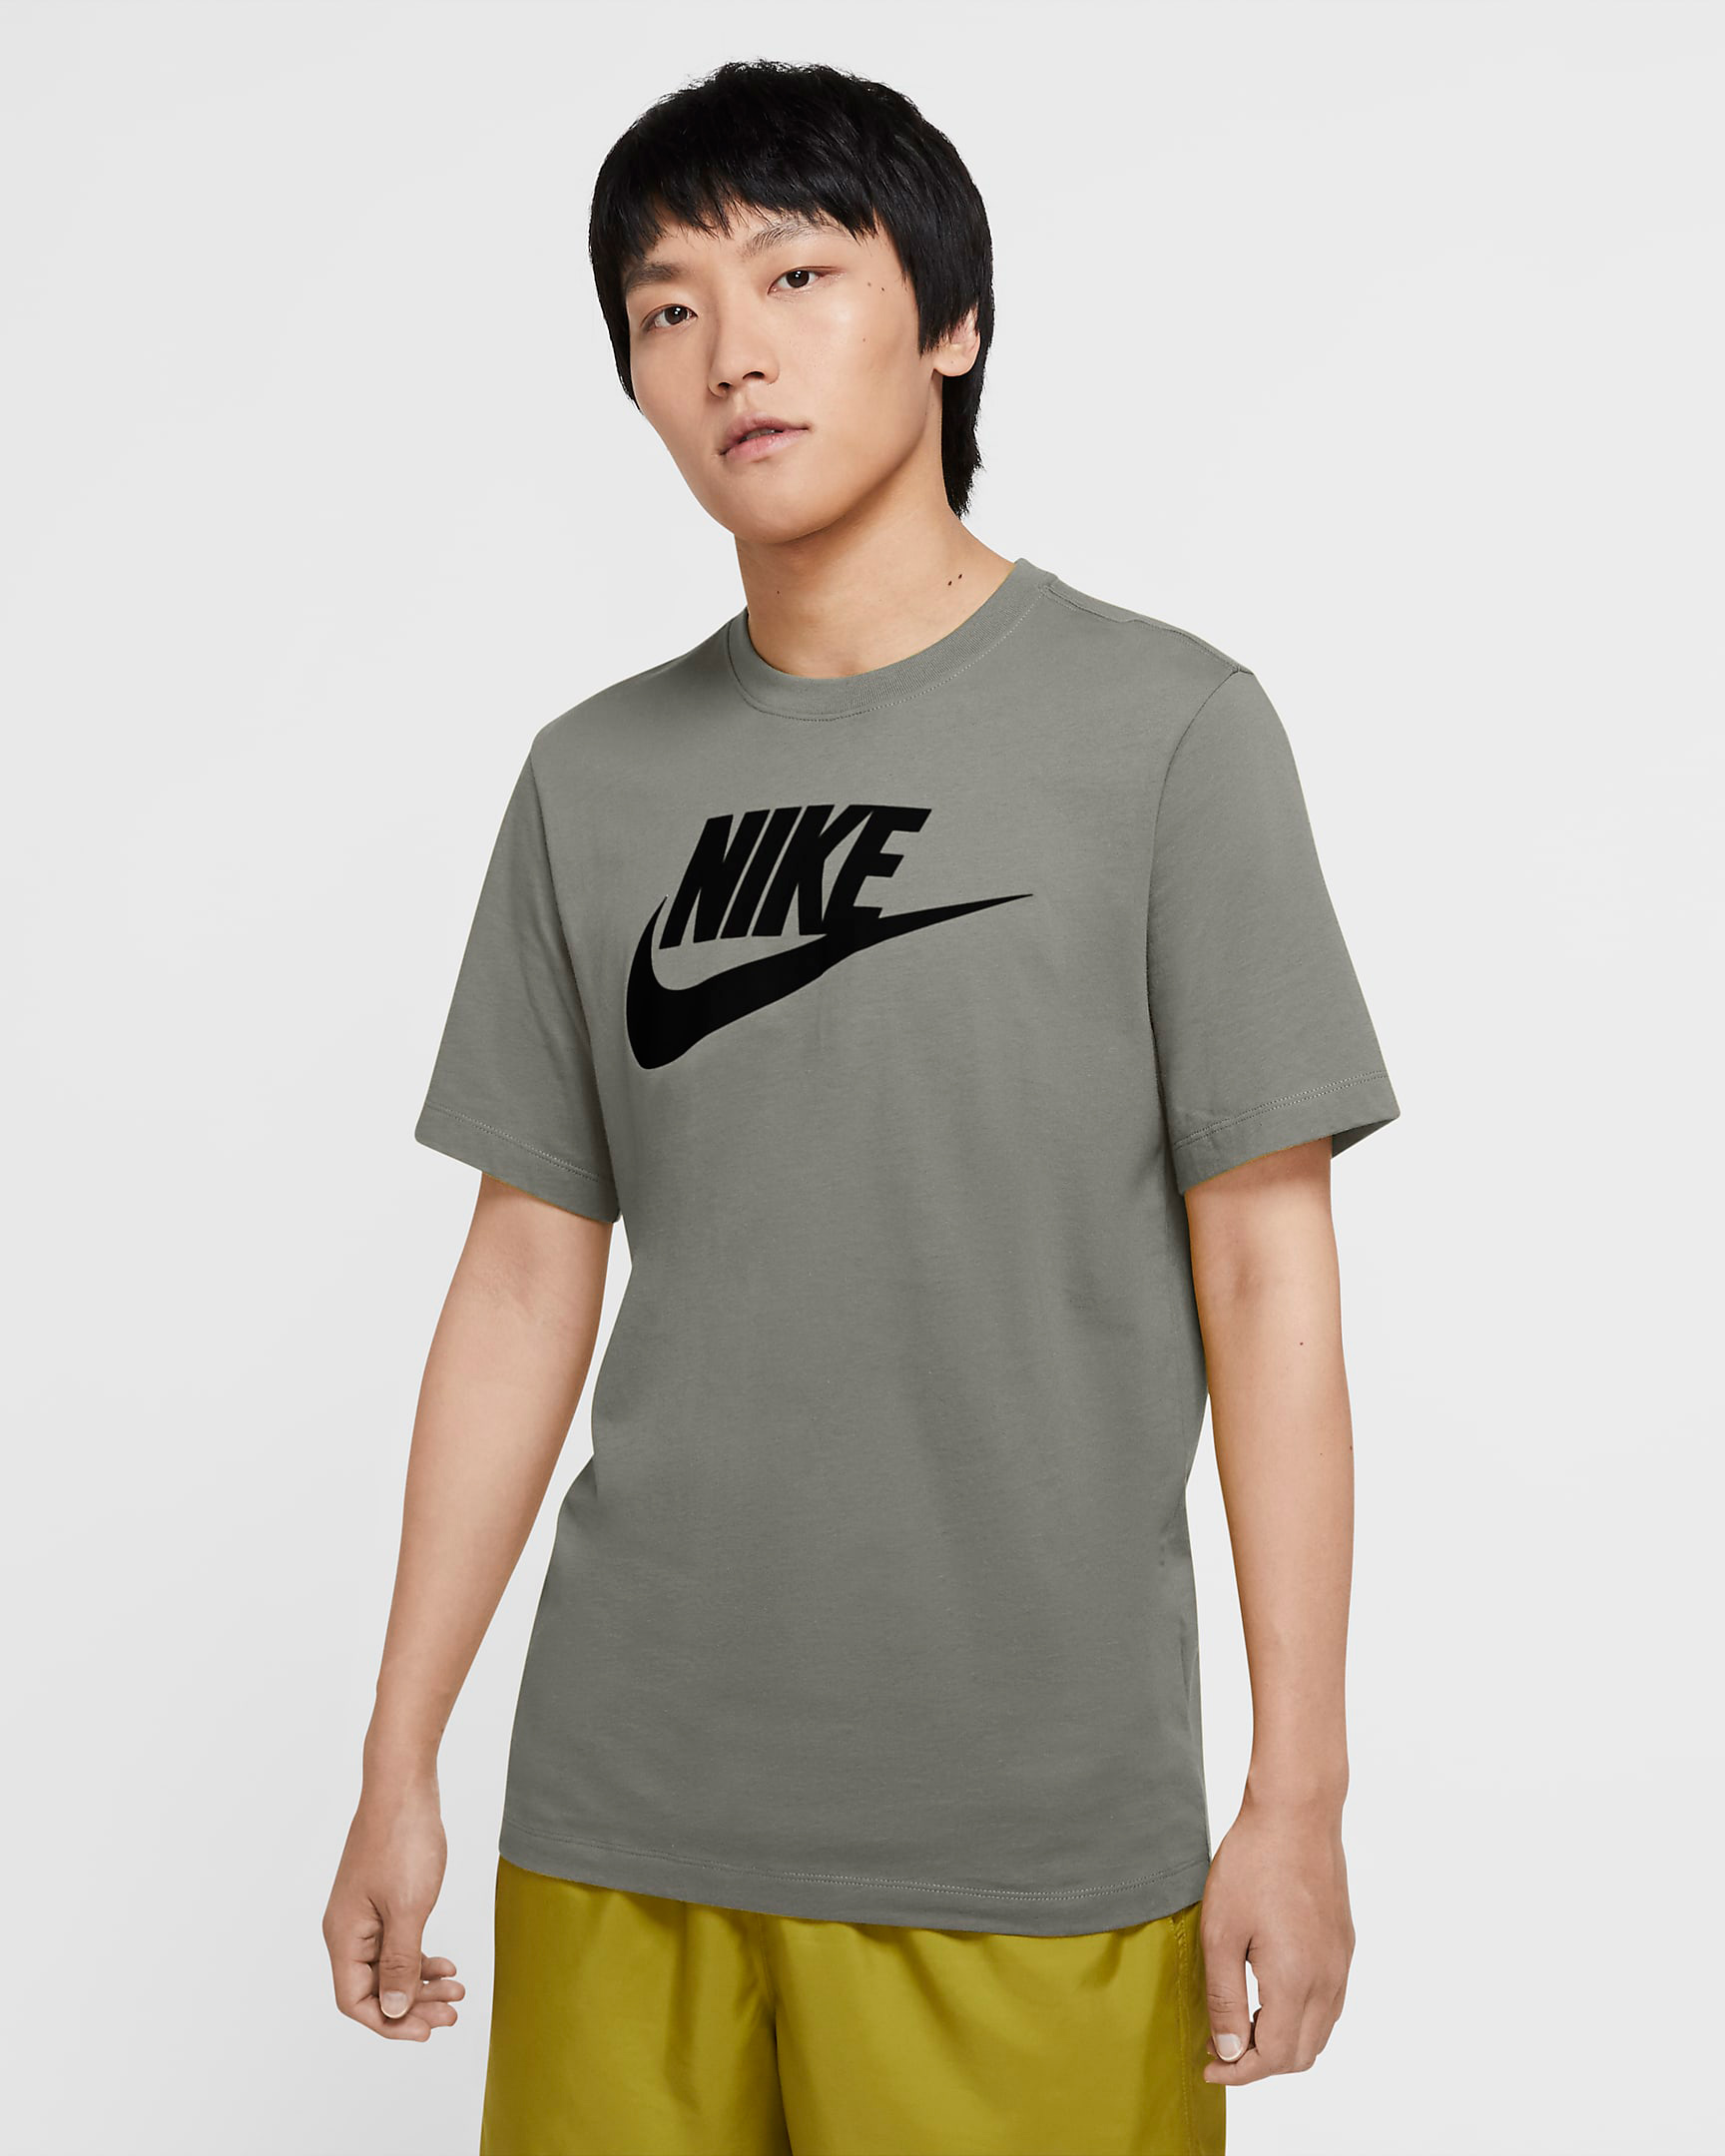 nike-light-army-t-shirt